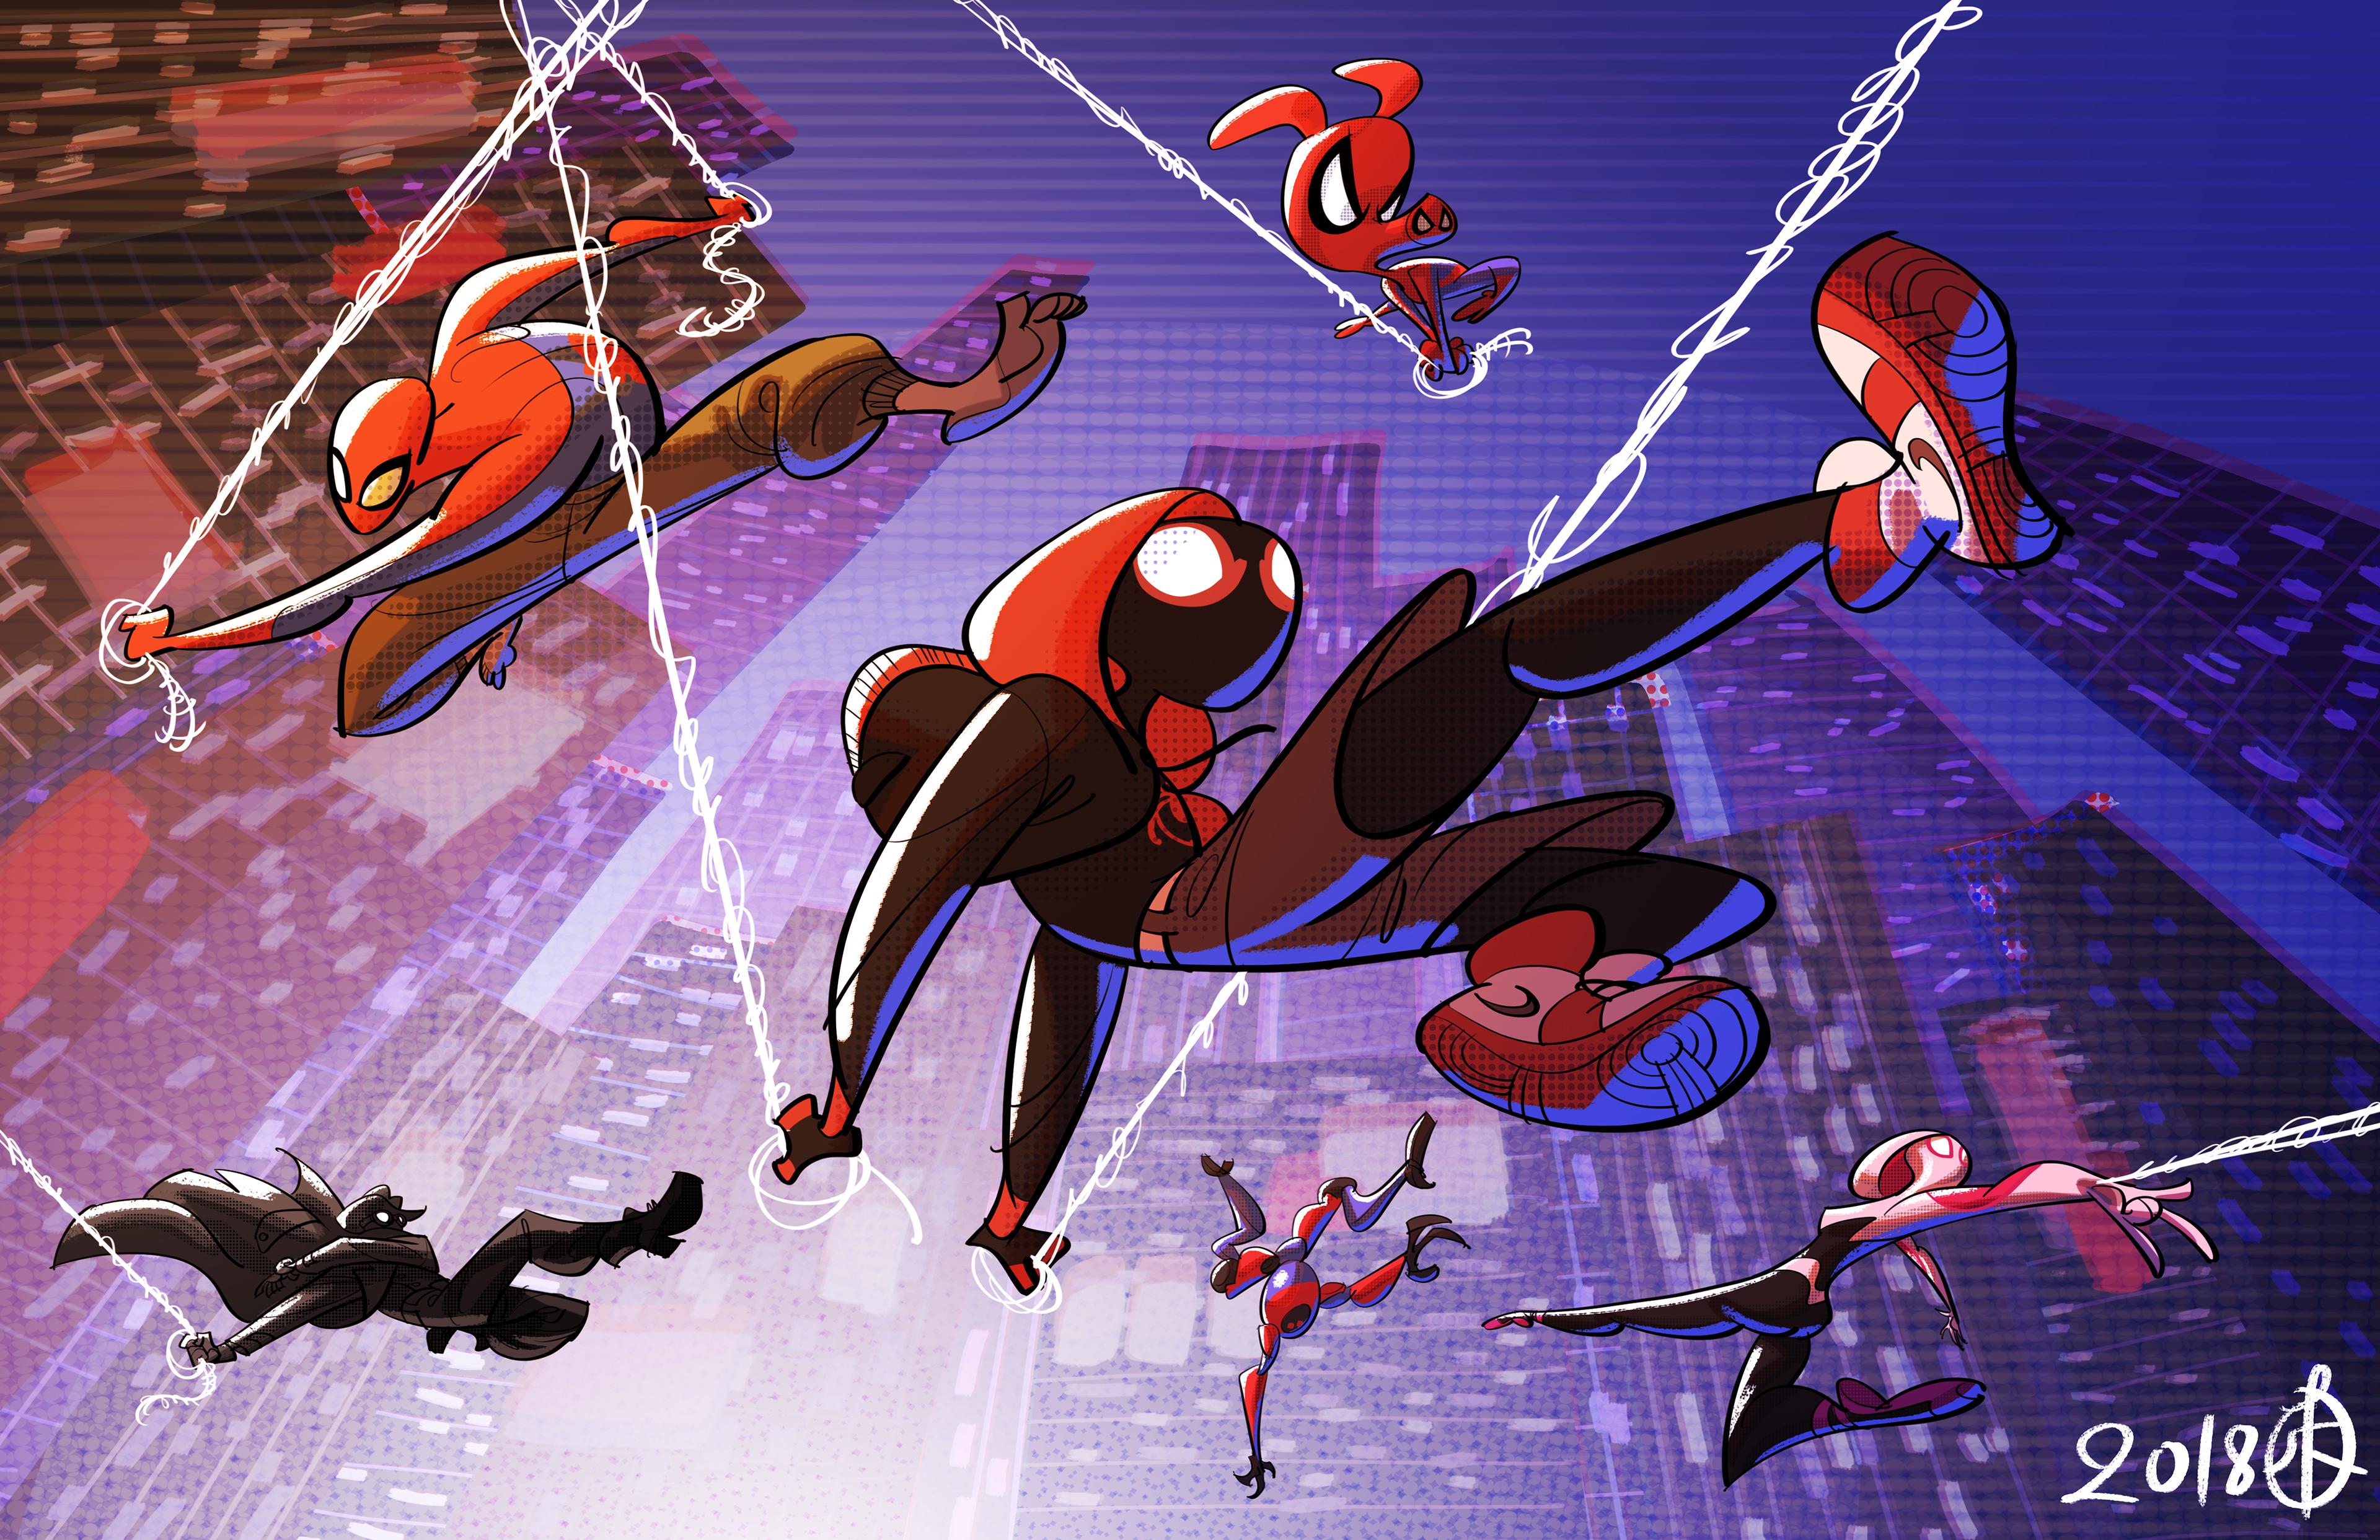 Spider Man Un Nuevo Universo 4k Ultra Fondo De Pantalla Hd Fondo